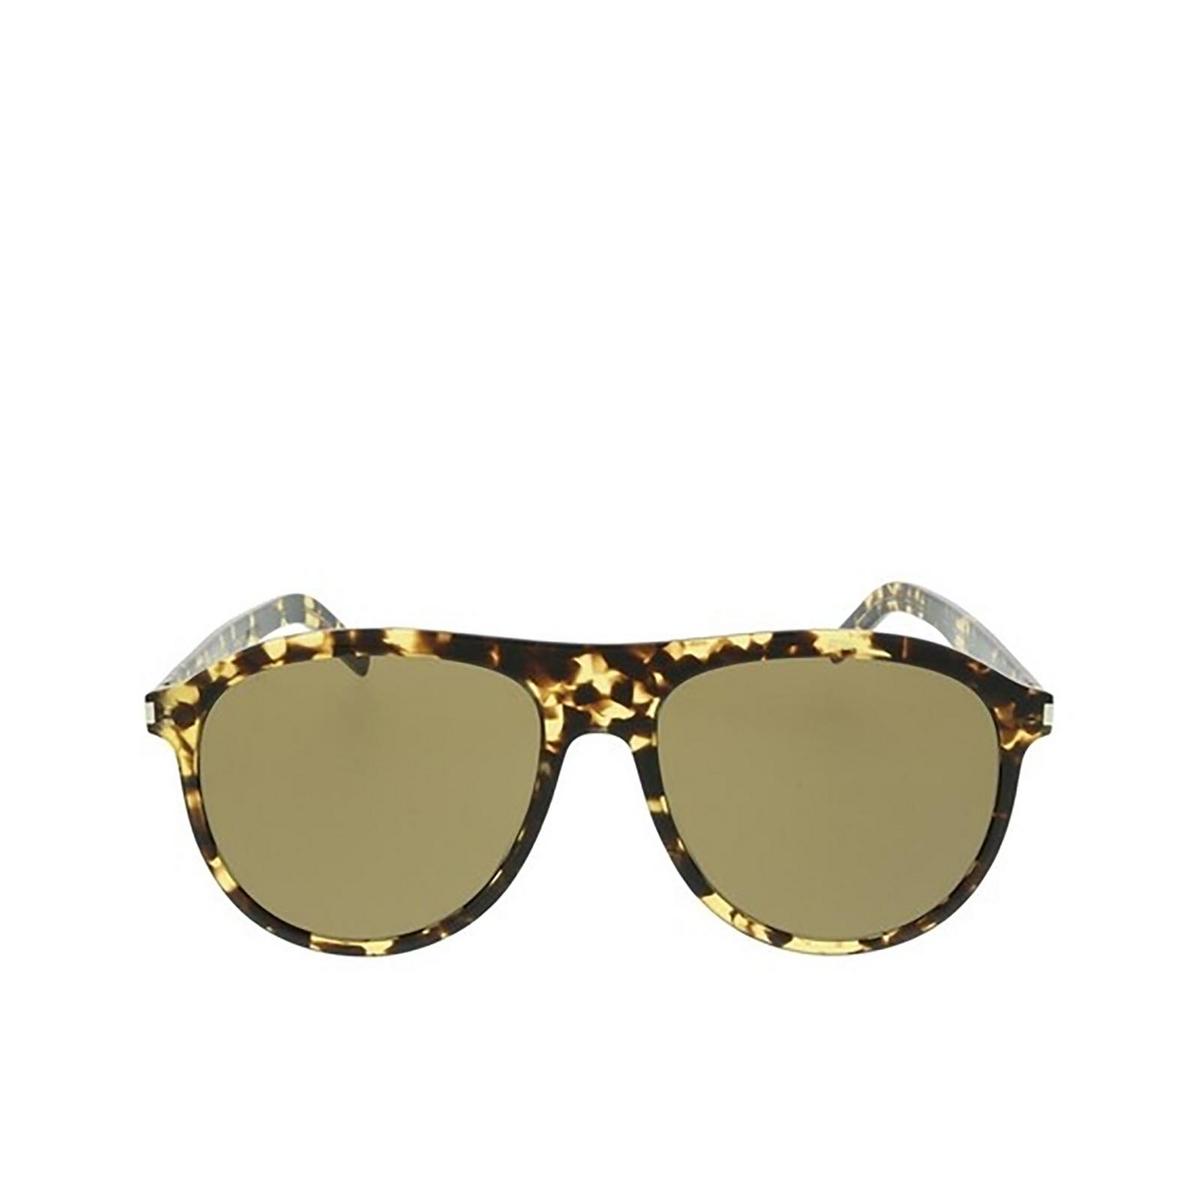 Saint Laurent® Aviator Sunglasses: SL 432 SLIM color Yellow Havana 004 - front view.